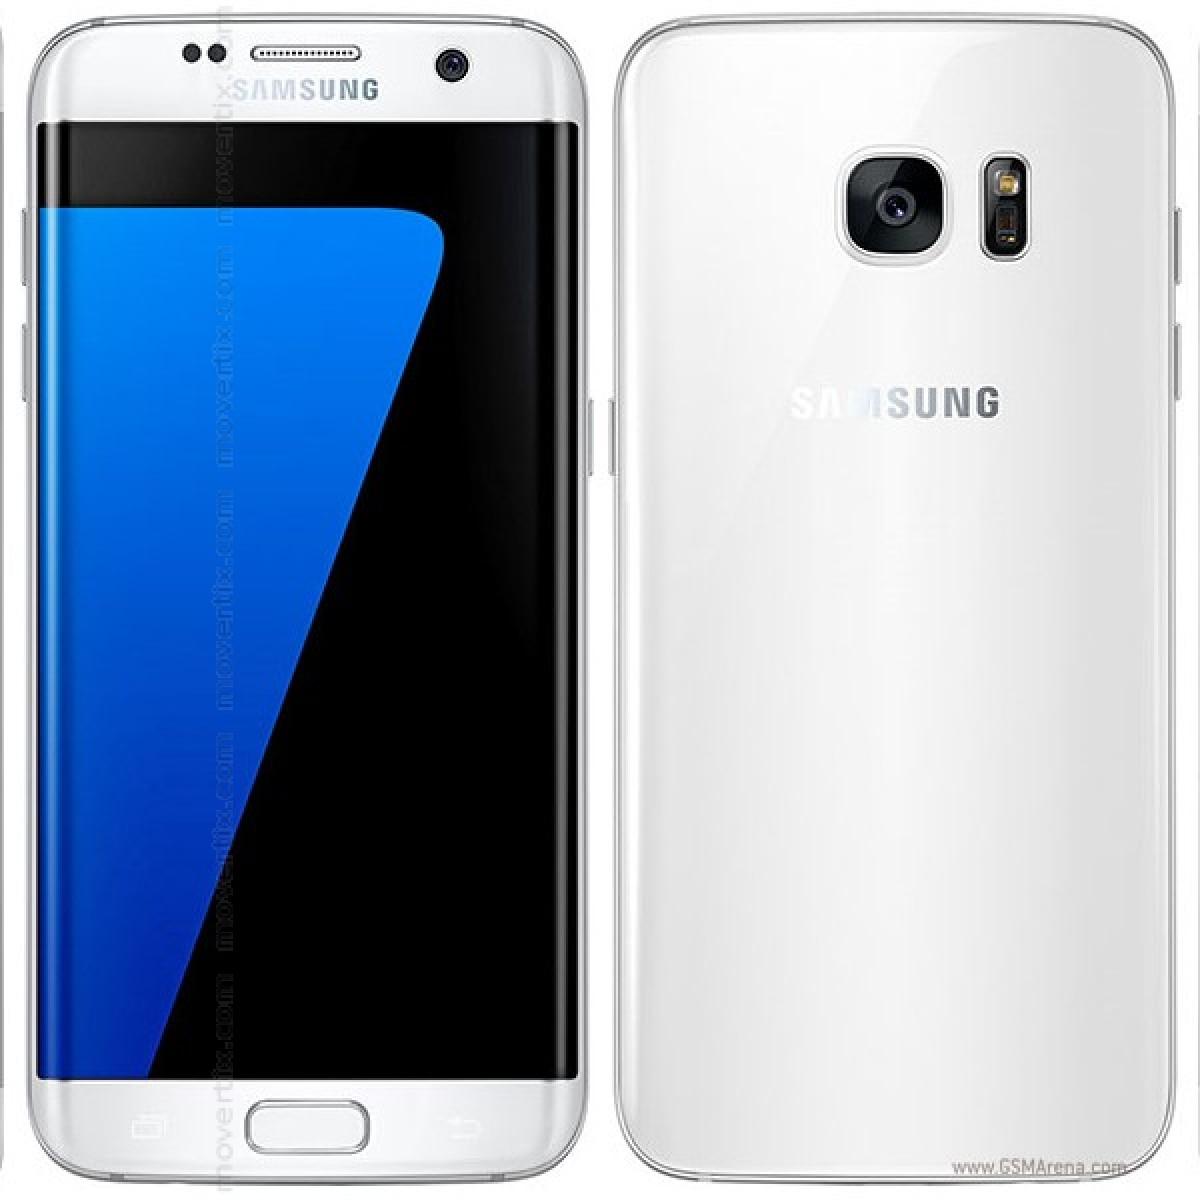 samsung galaxy s7 edge white 32gb g935f 8806088319223 movertix mobile phones shop. Black Bedroom Furniture Sets. Home Design Ideas